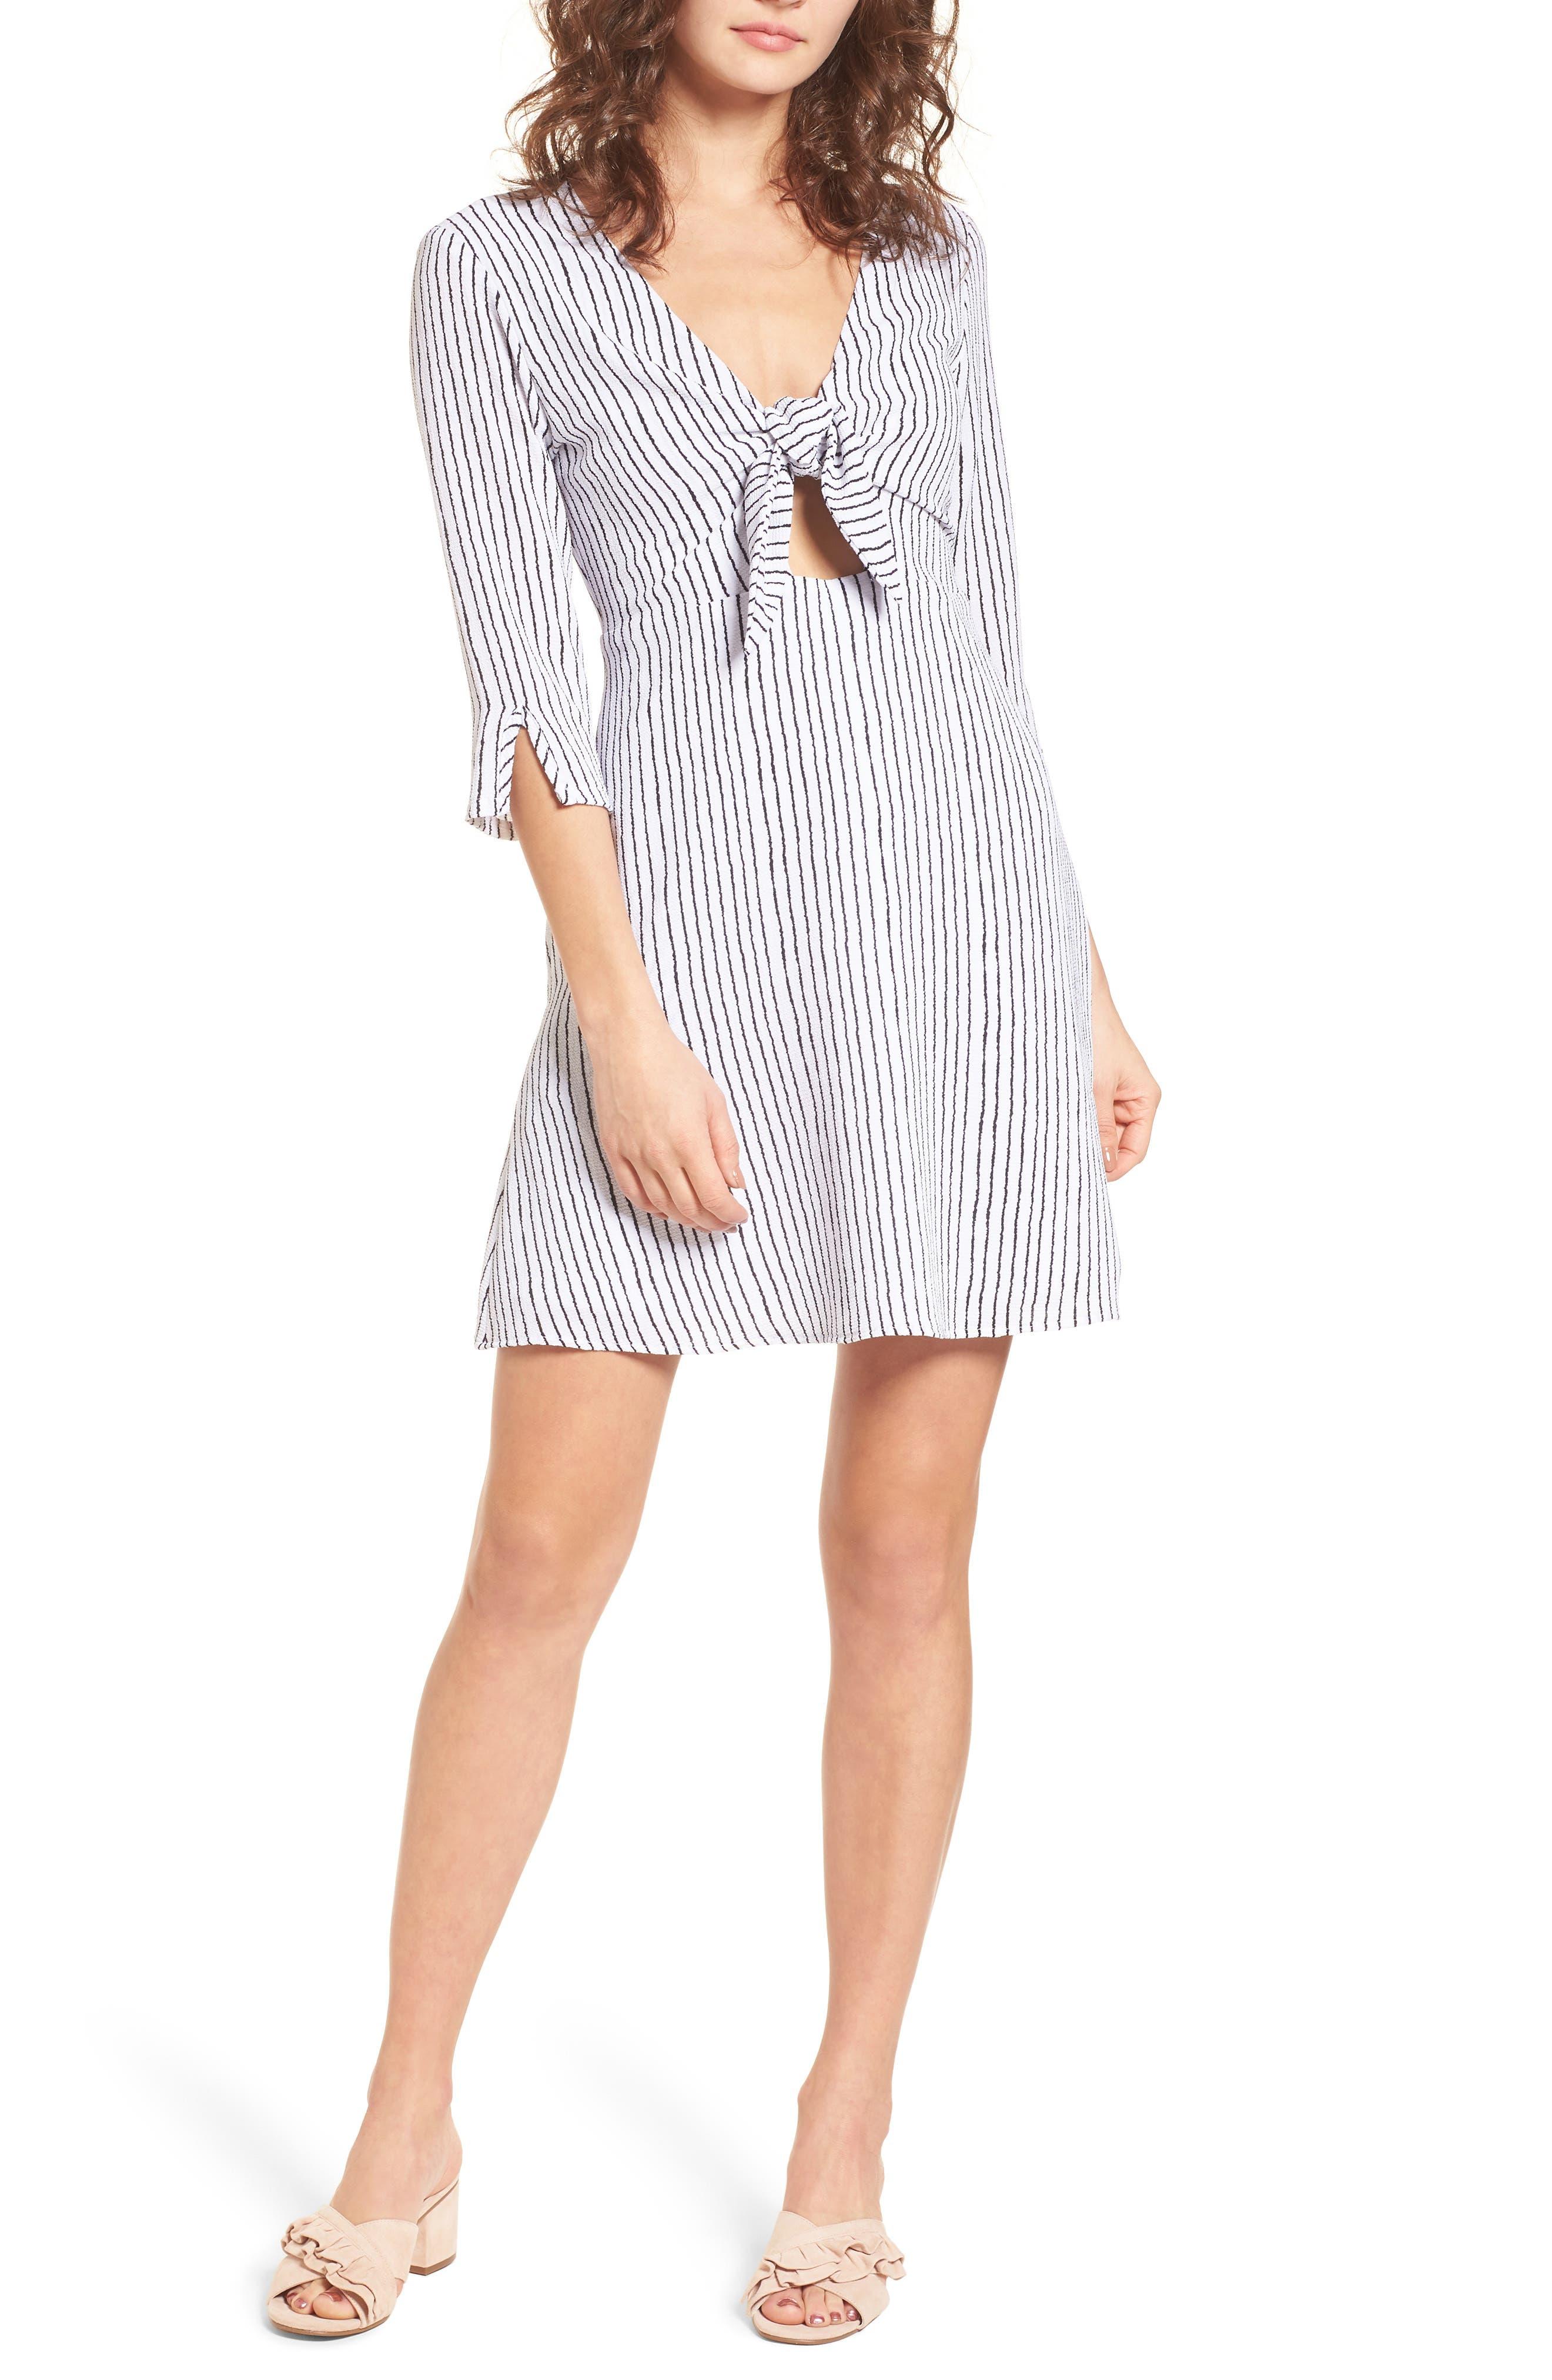 Mima Chica Tie Front Minidress